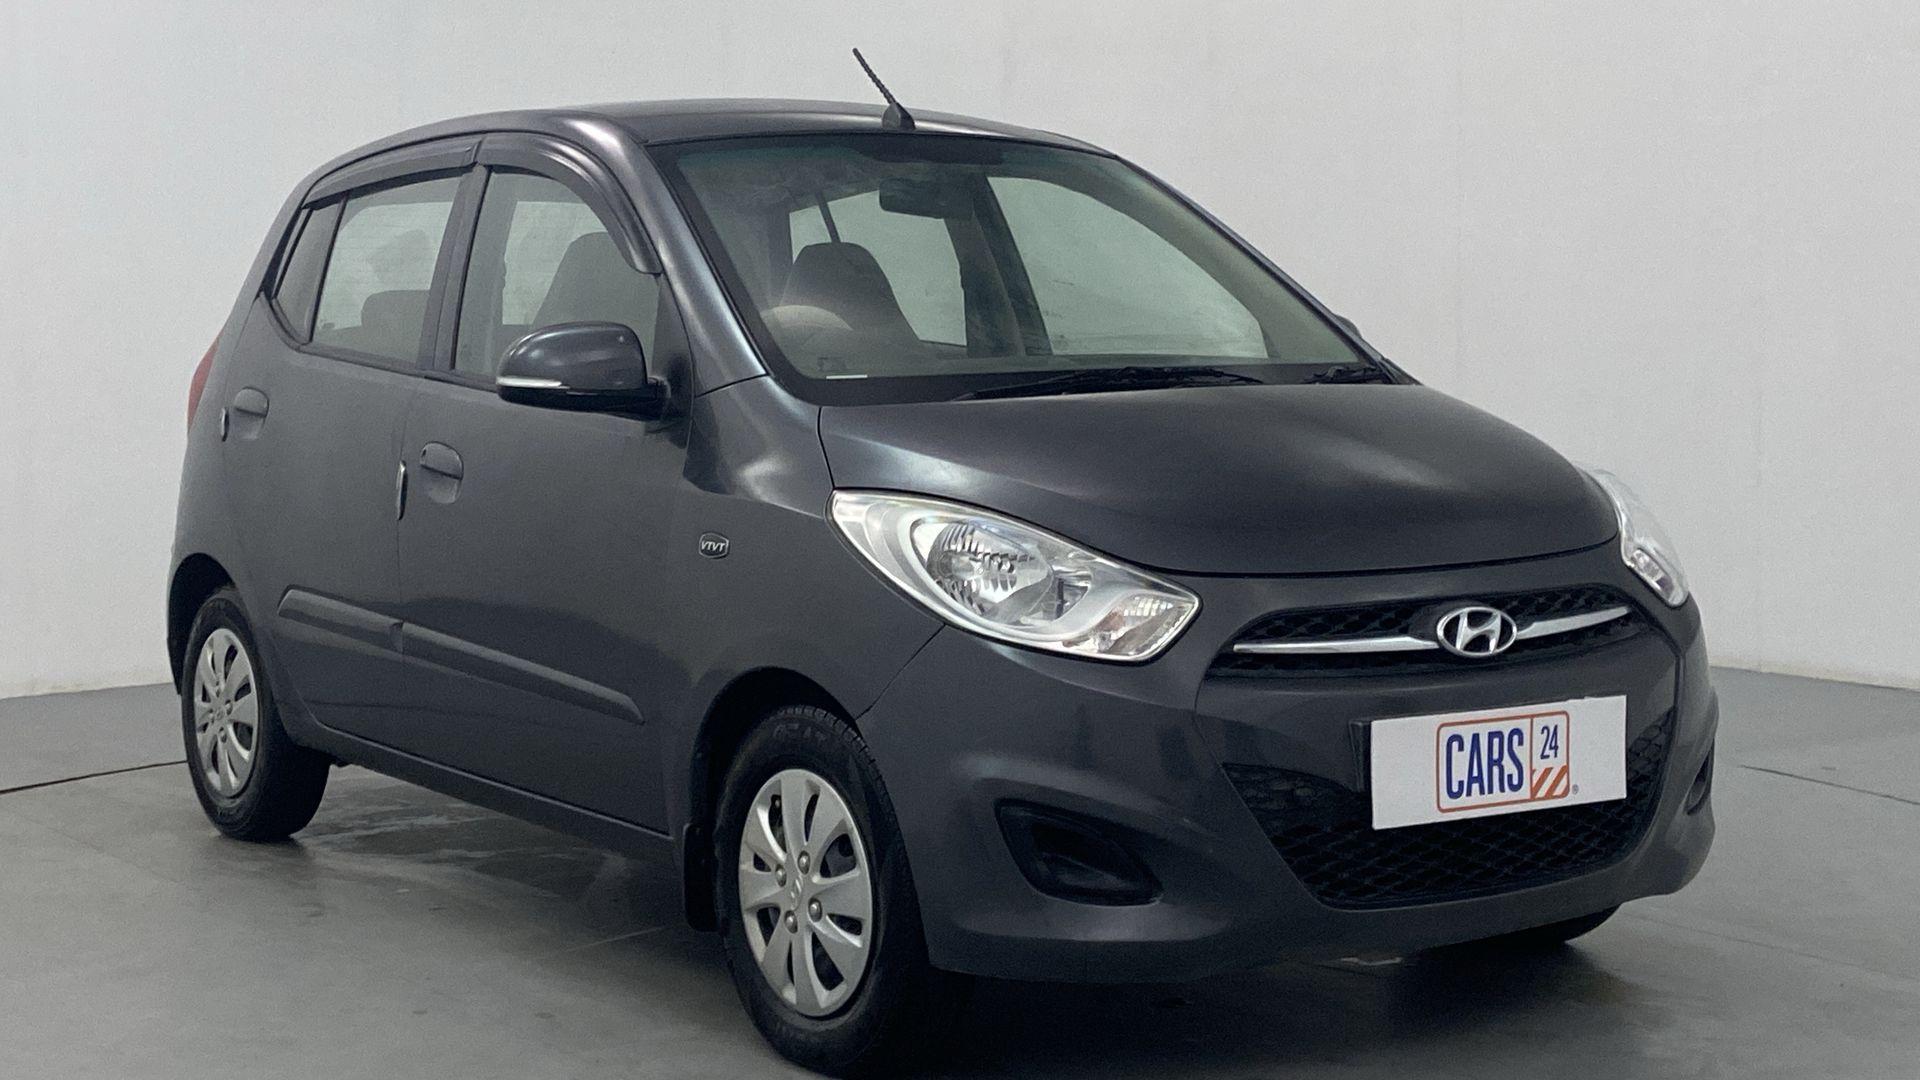 2010 Hyundai i10 SPORTZ 1.2 KAPPA2